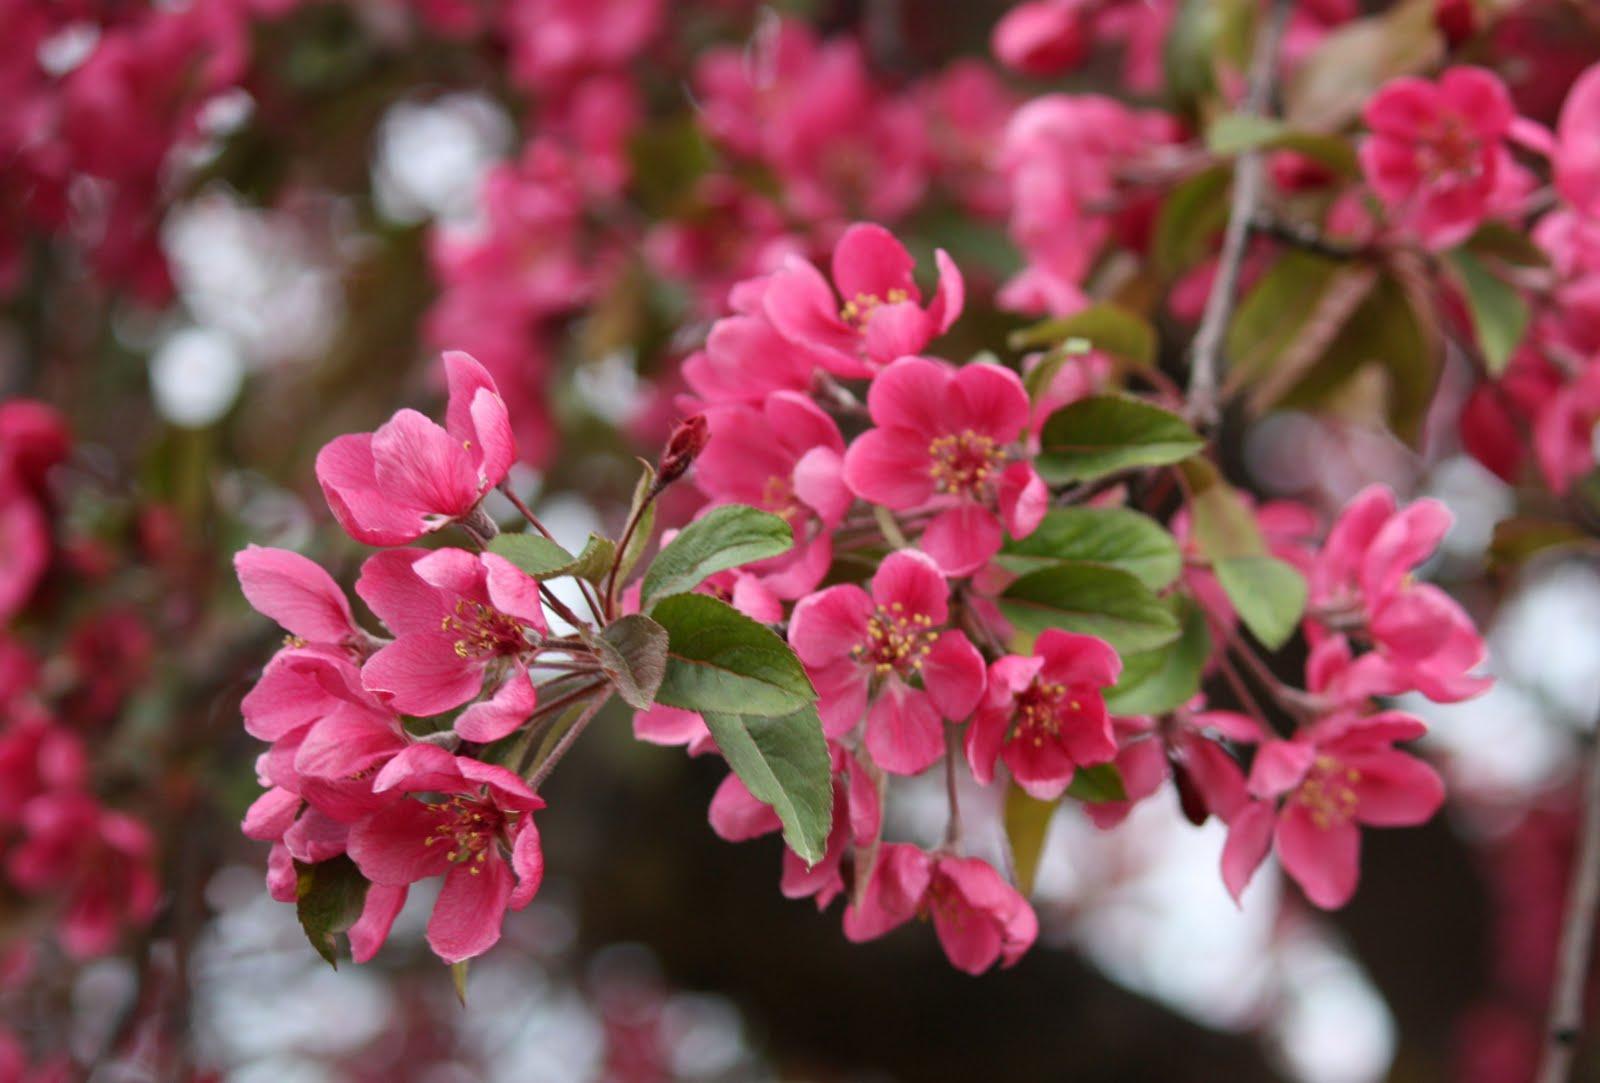 boise daily photo garden shot crab apple tree blossoms. Black Bedroom Furniture Sets. Home Design Ideas